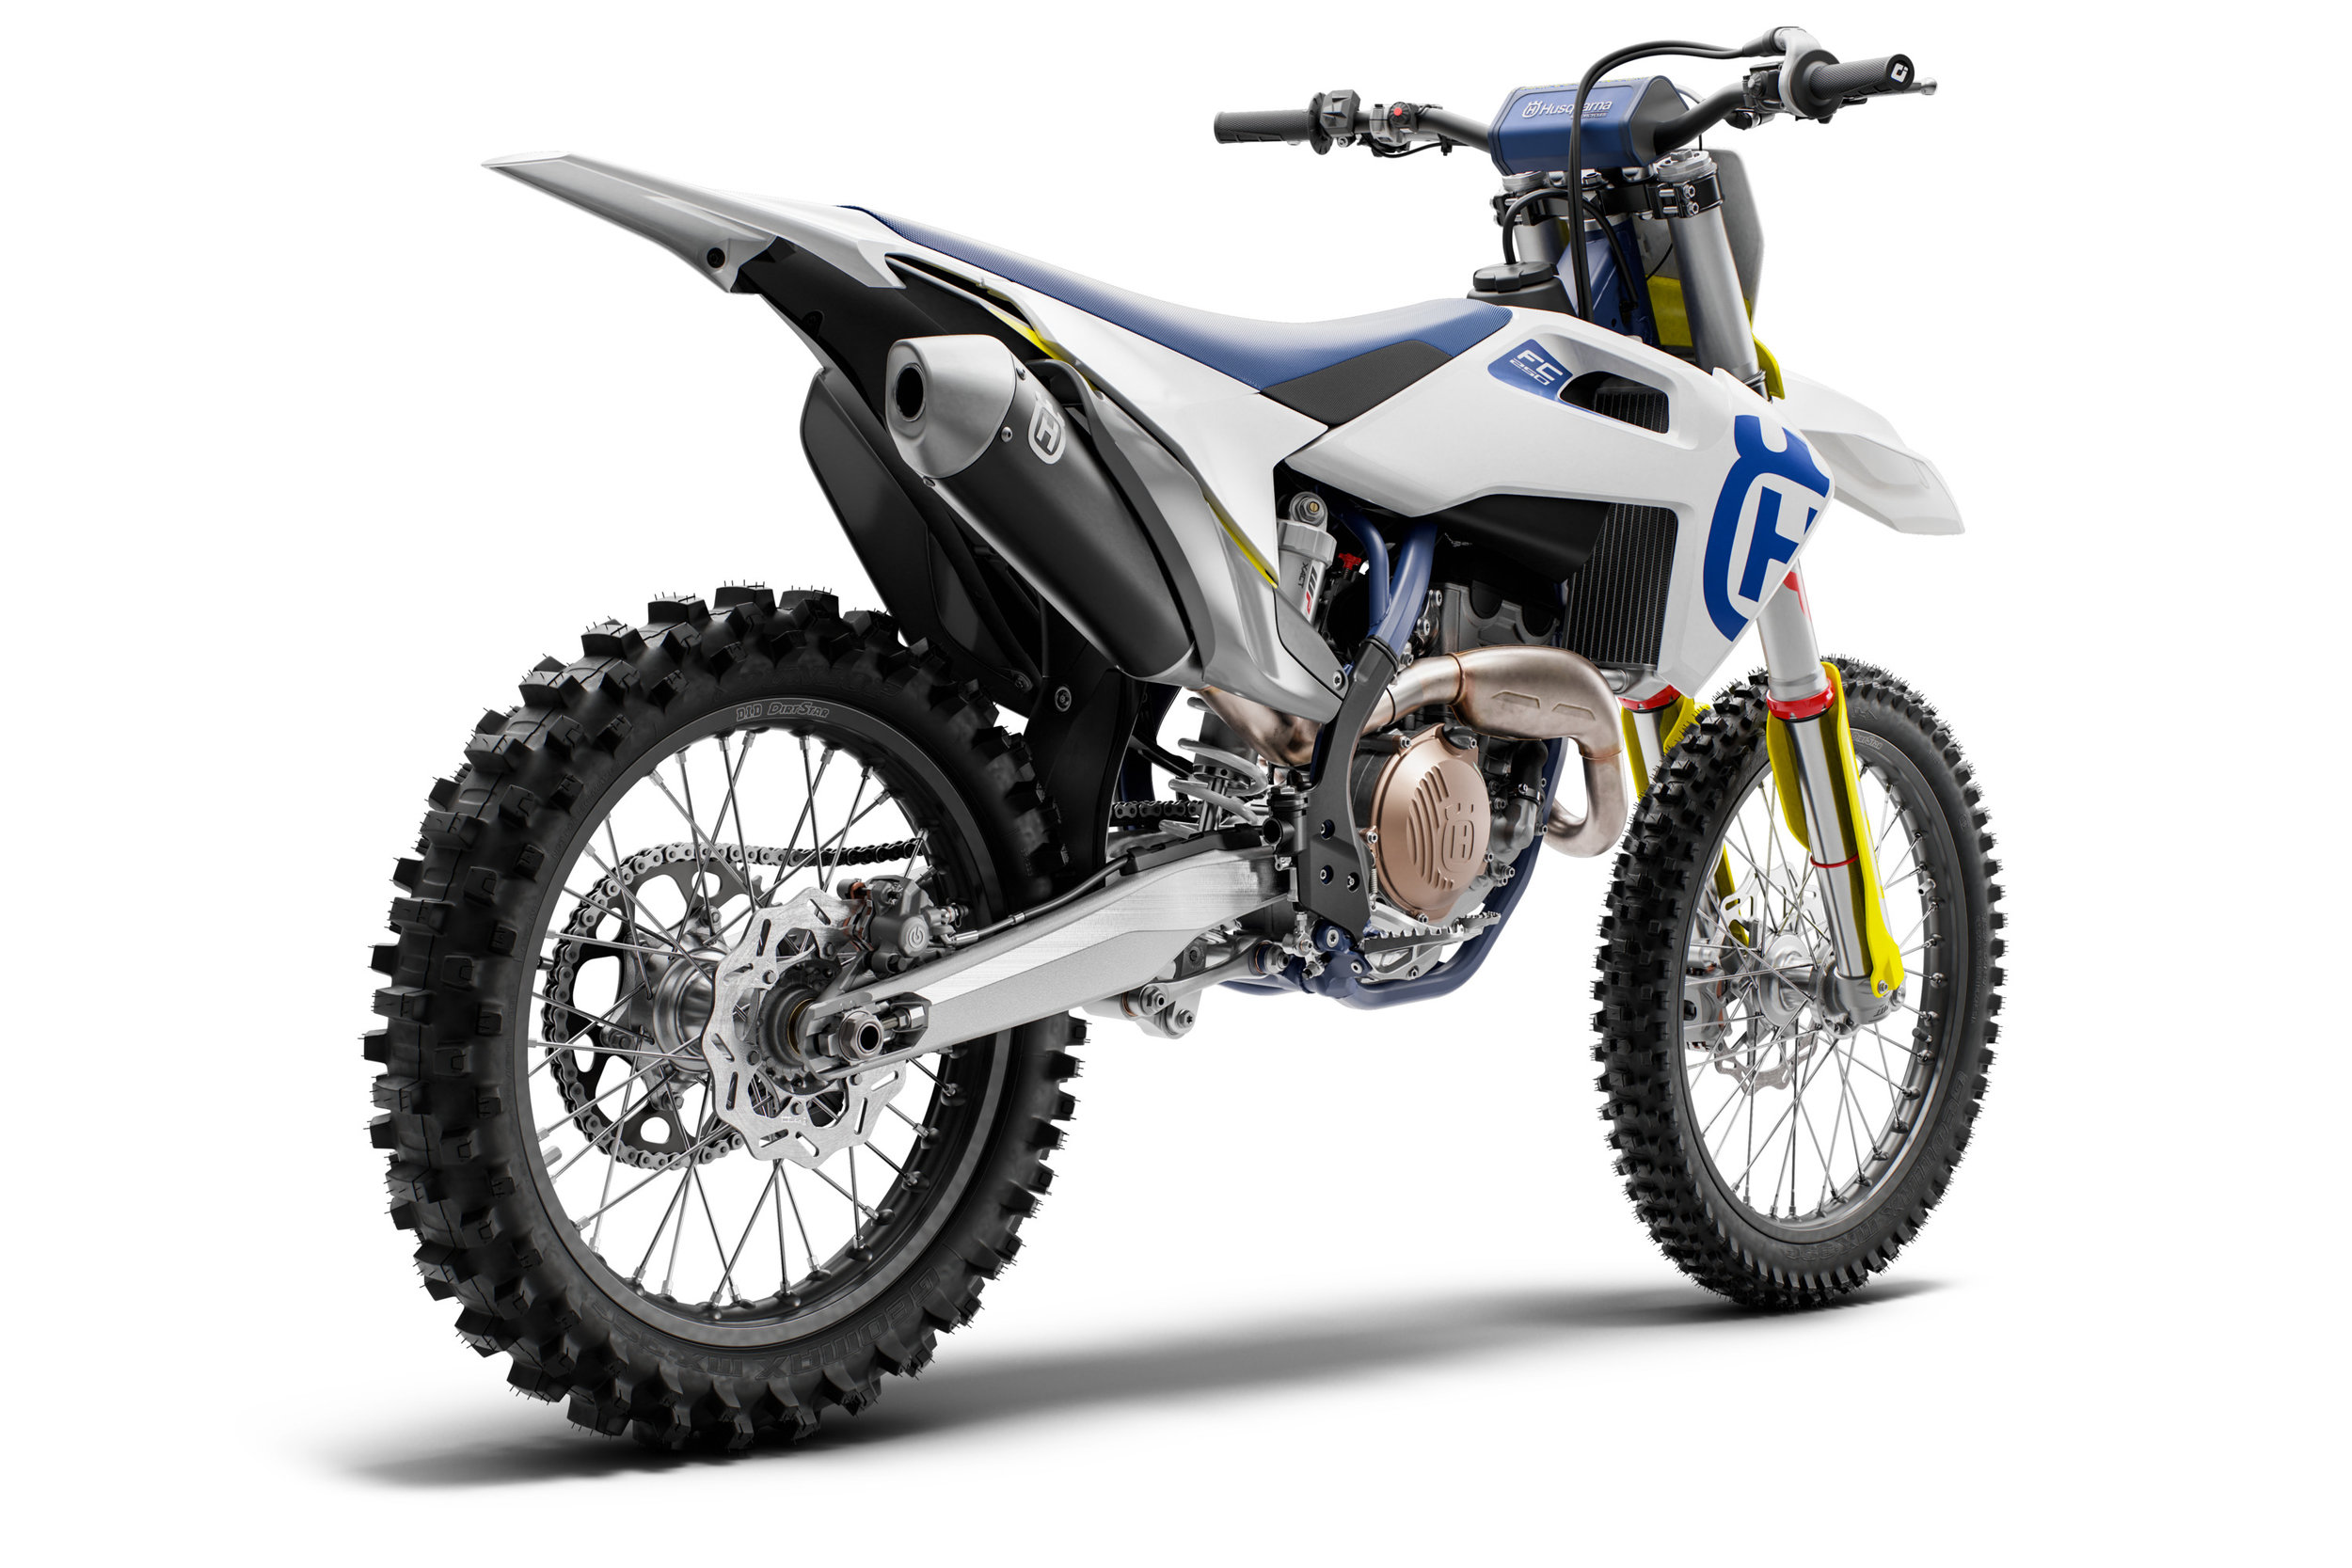 2020 FC250